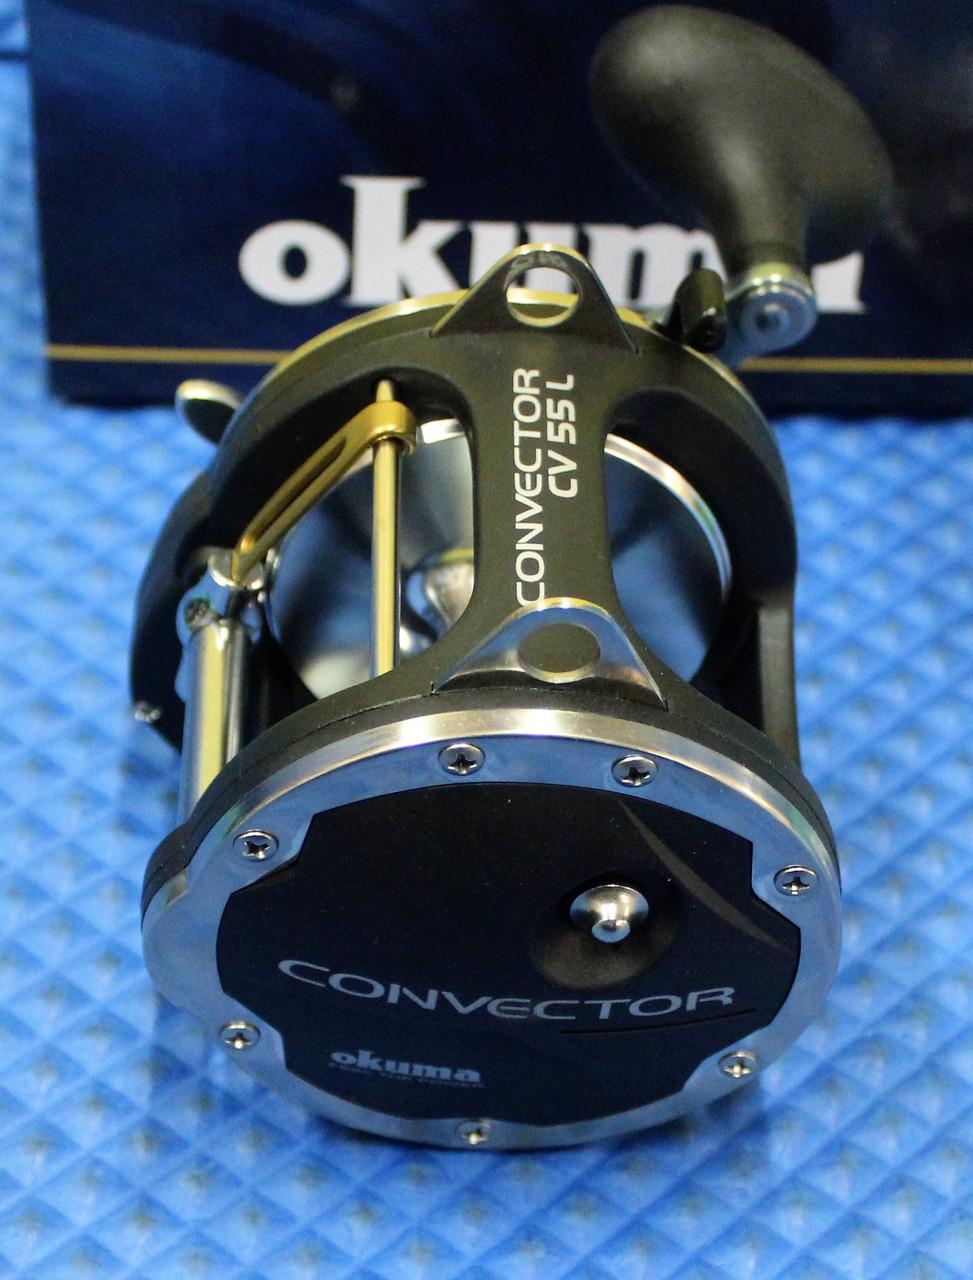 Okuma Convector Star Drag Levelwind Trolling Reel With Dragmasters Washers CV 55L